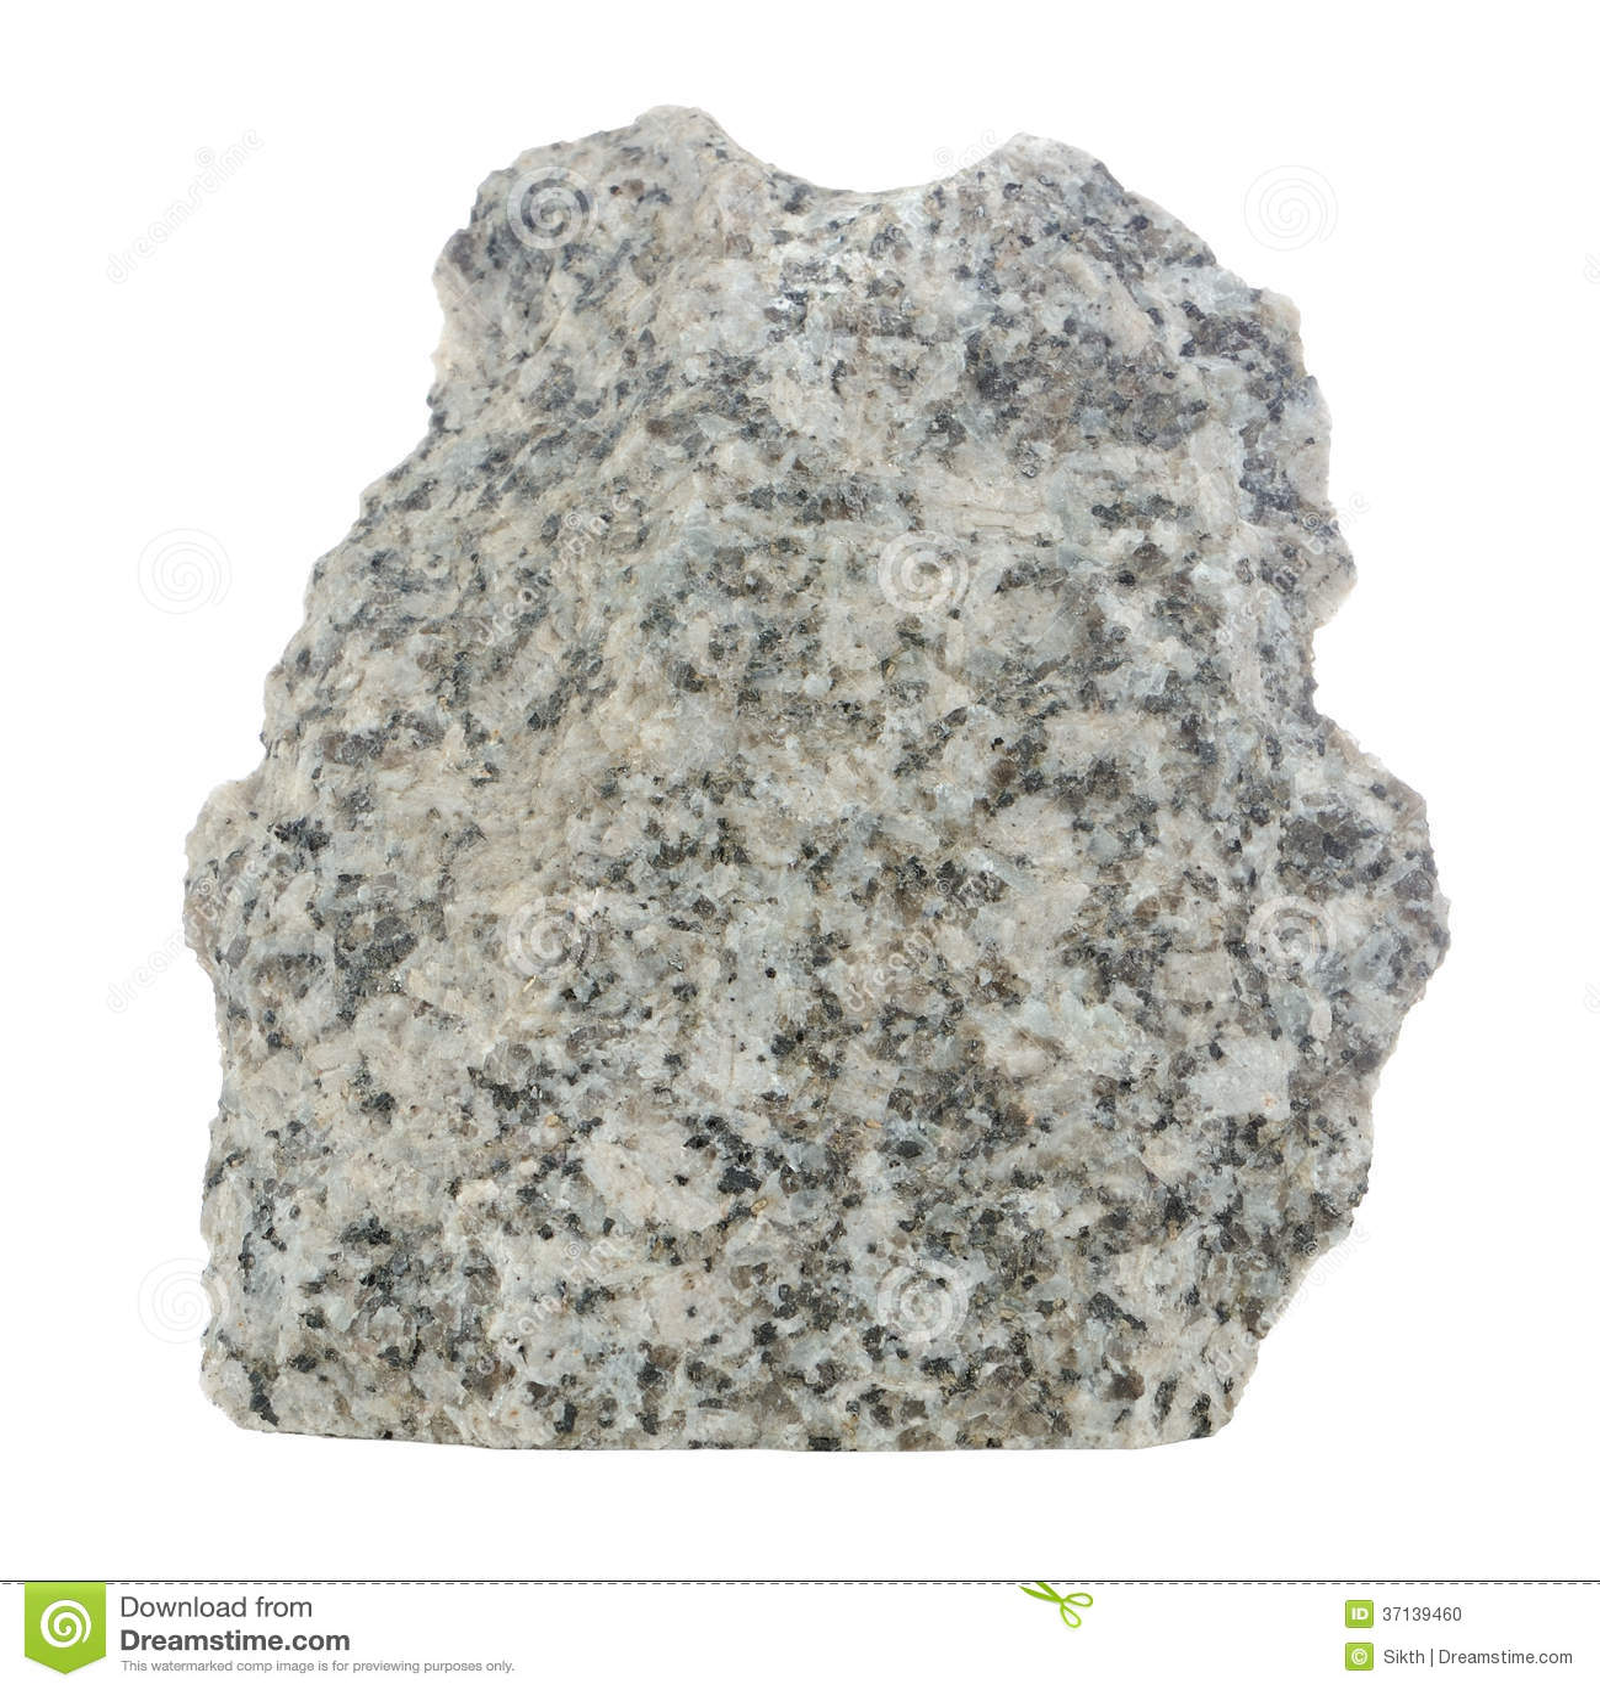 Large White Granite Rock : Grey granite stone isolated on white background stock